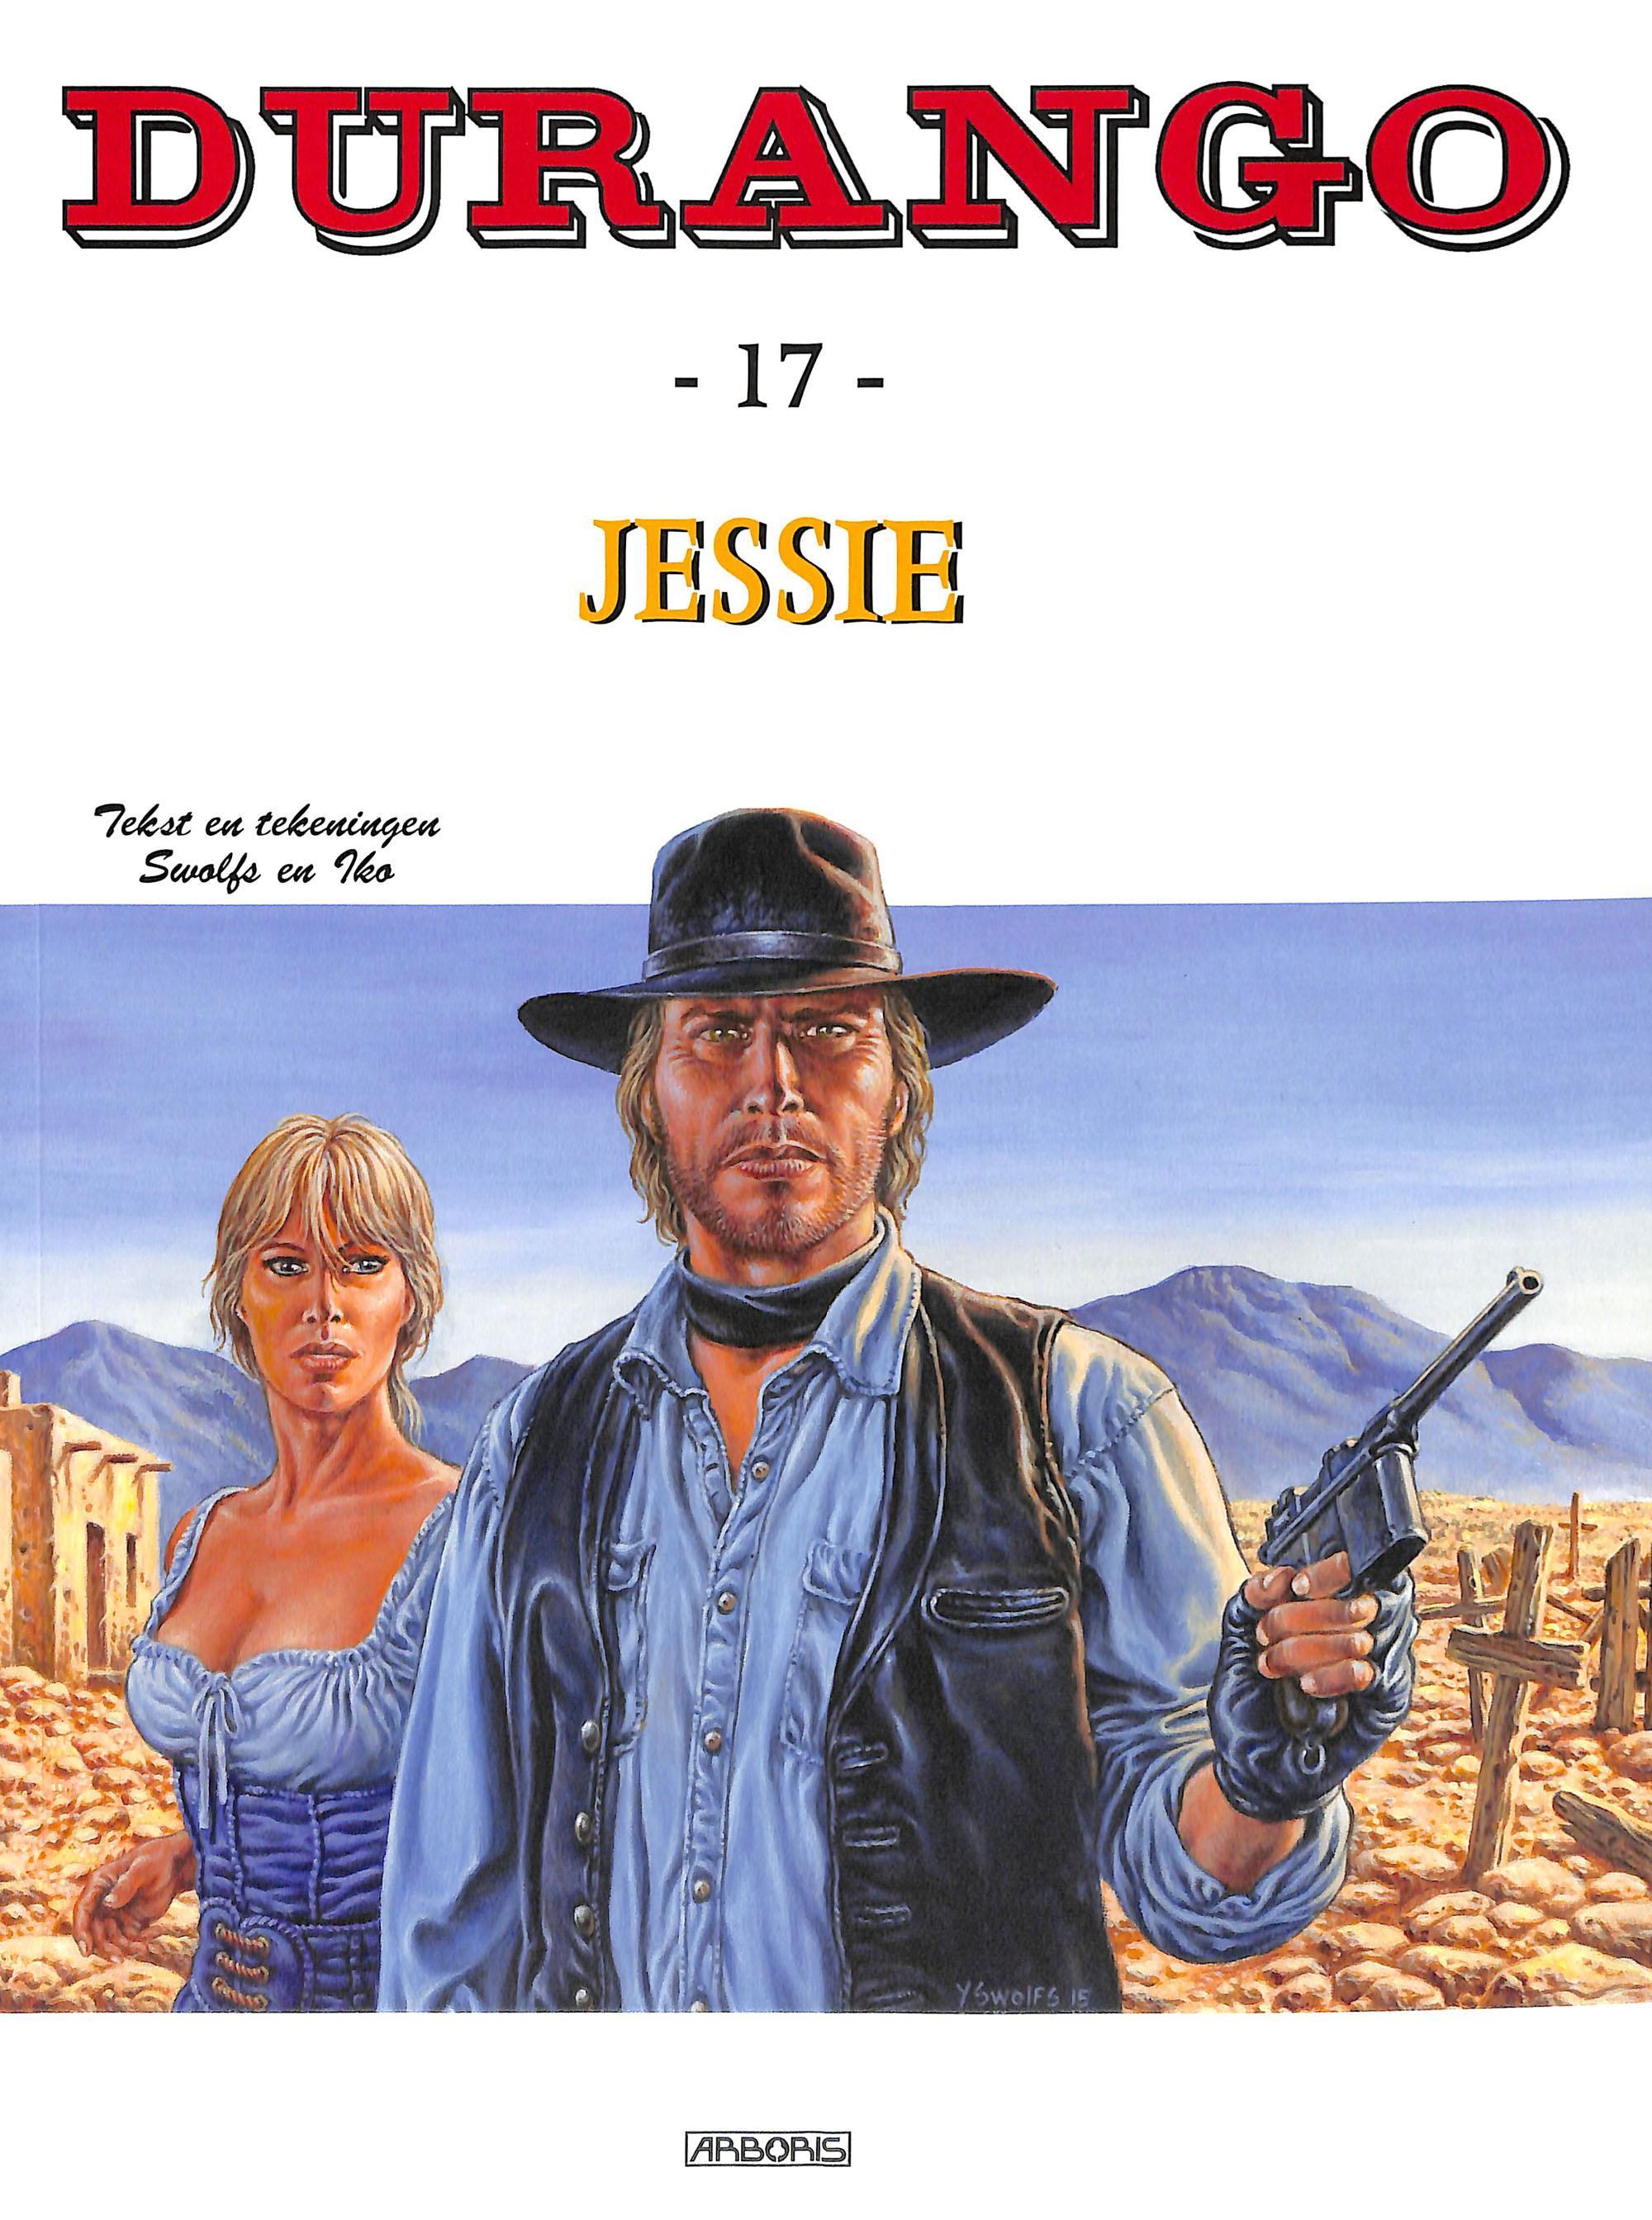 Durango - 17 - Jessie